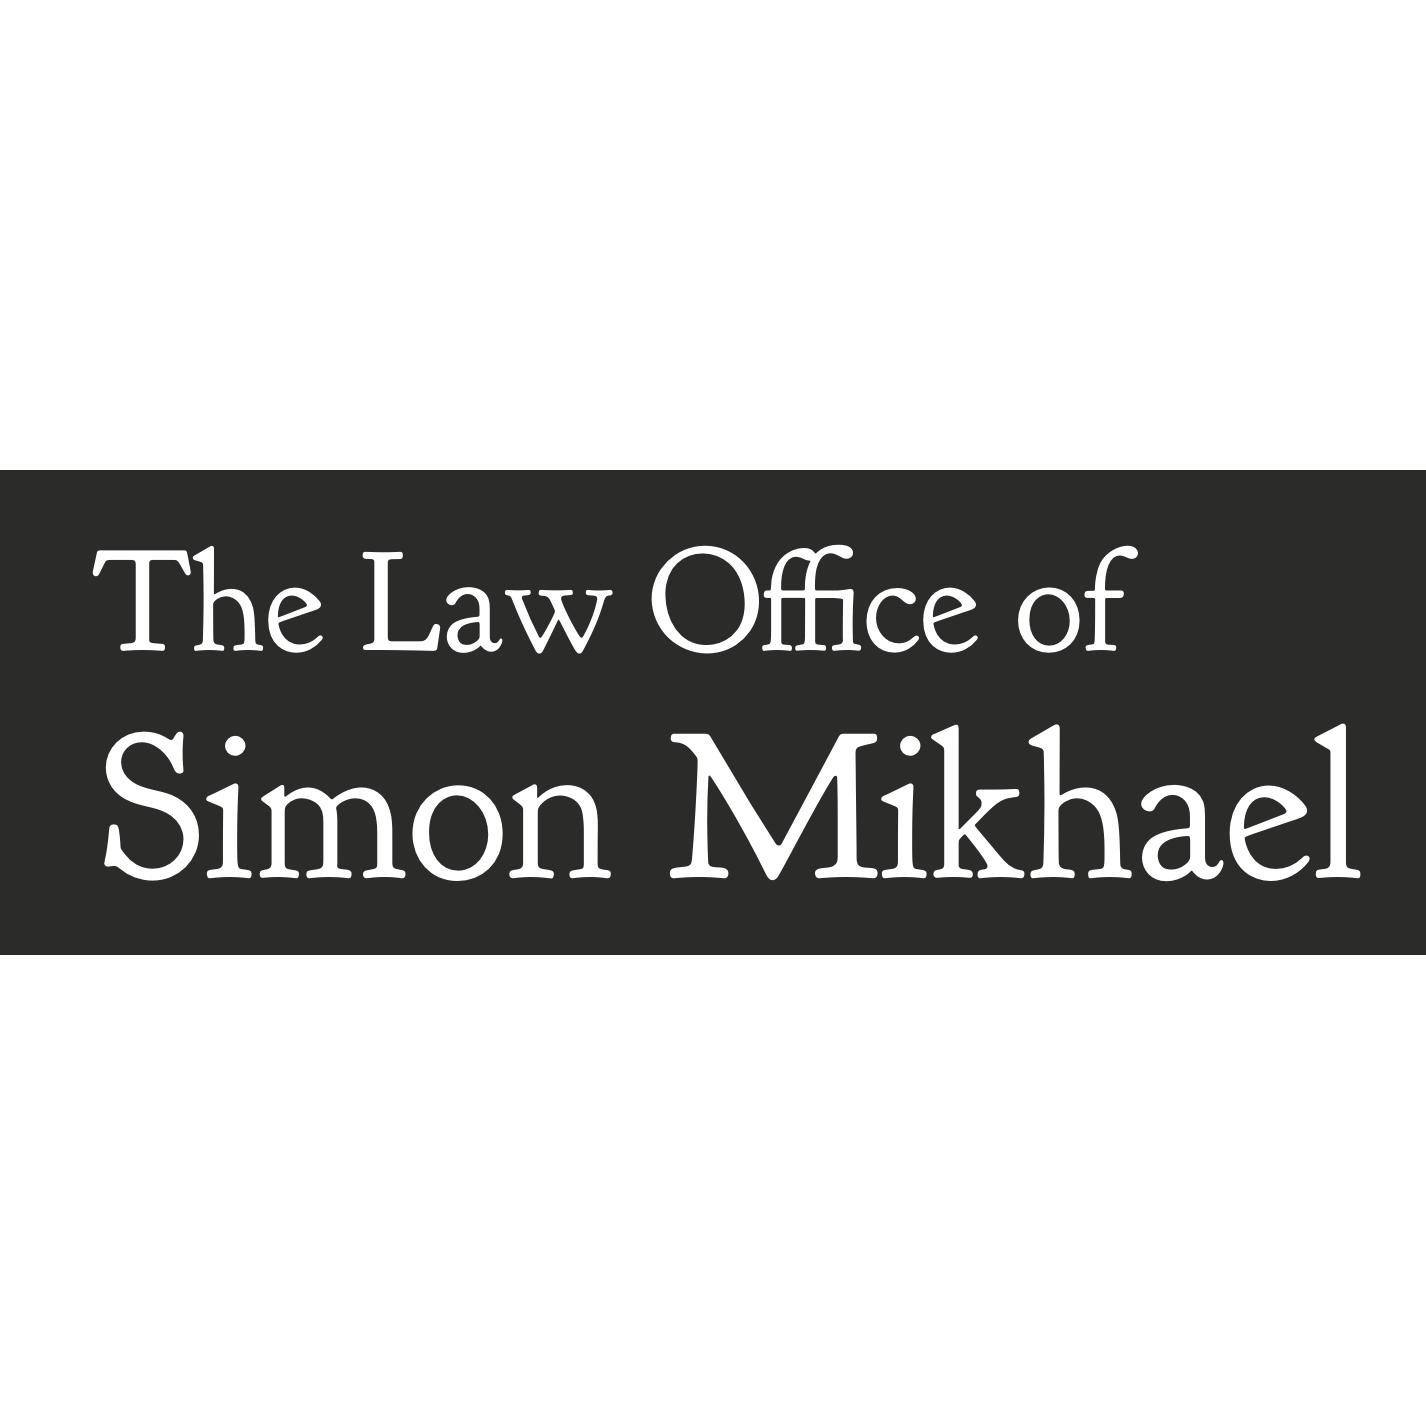 The Law Office of Simon Mikhael